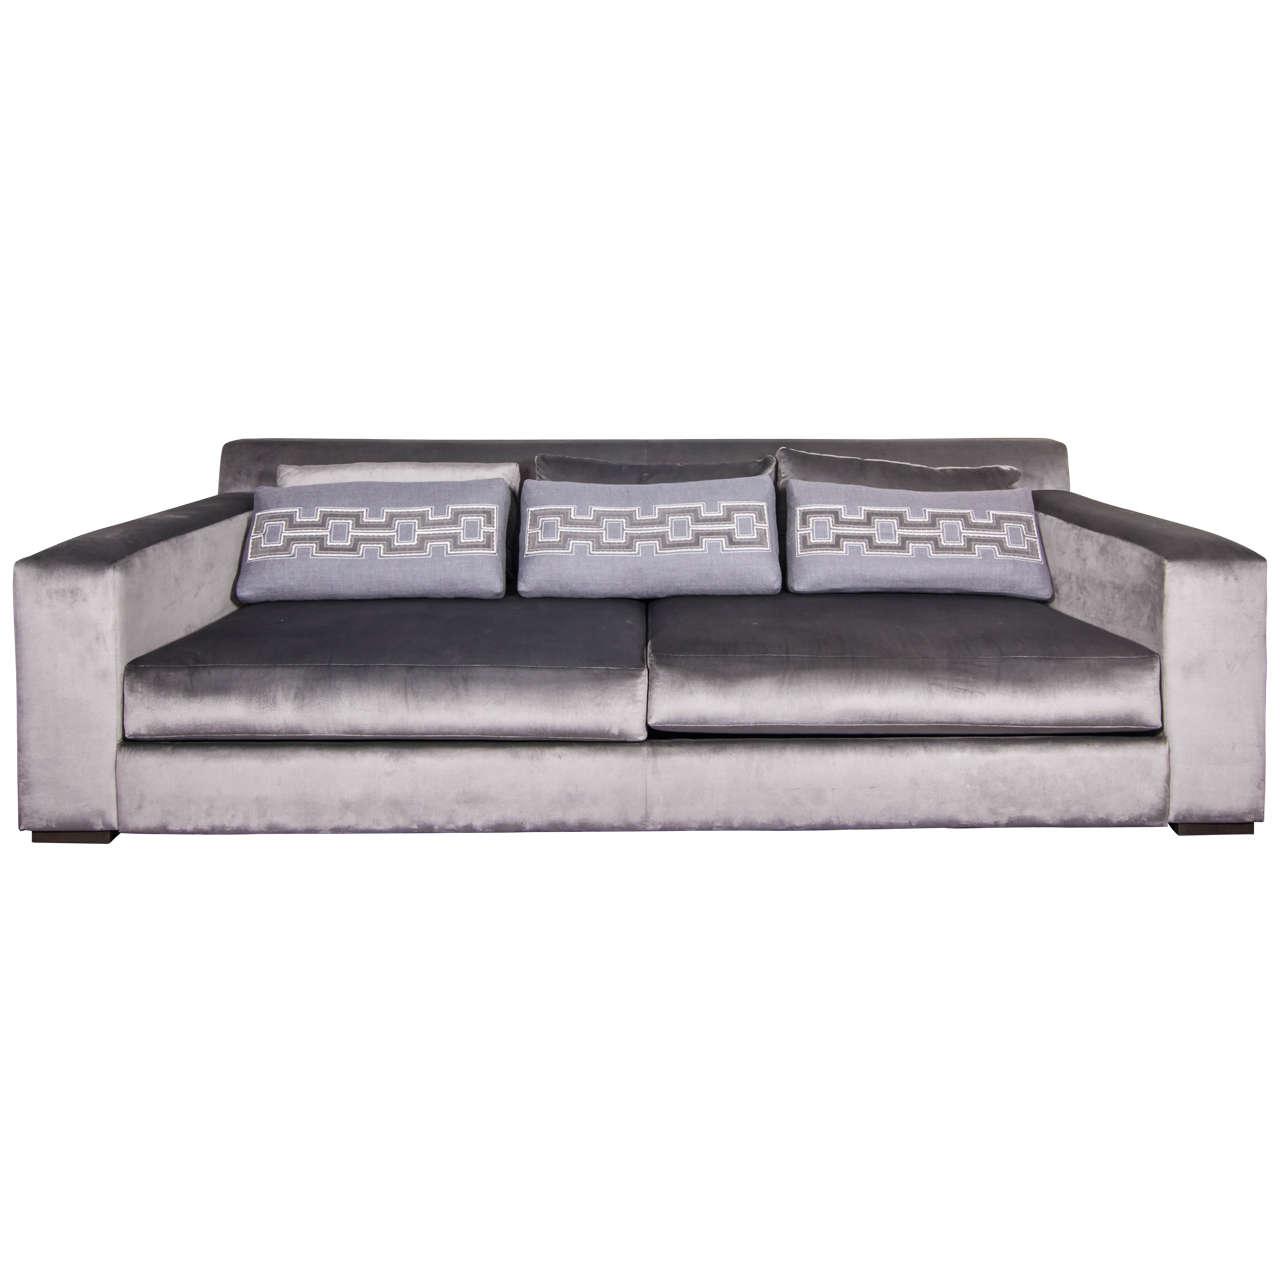 phillipe hurel sofa 39 lila 39 and custom applique pillows at. Black Bedroom Furniture Sets. Home Design Ideas